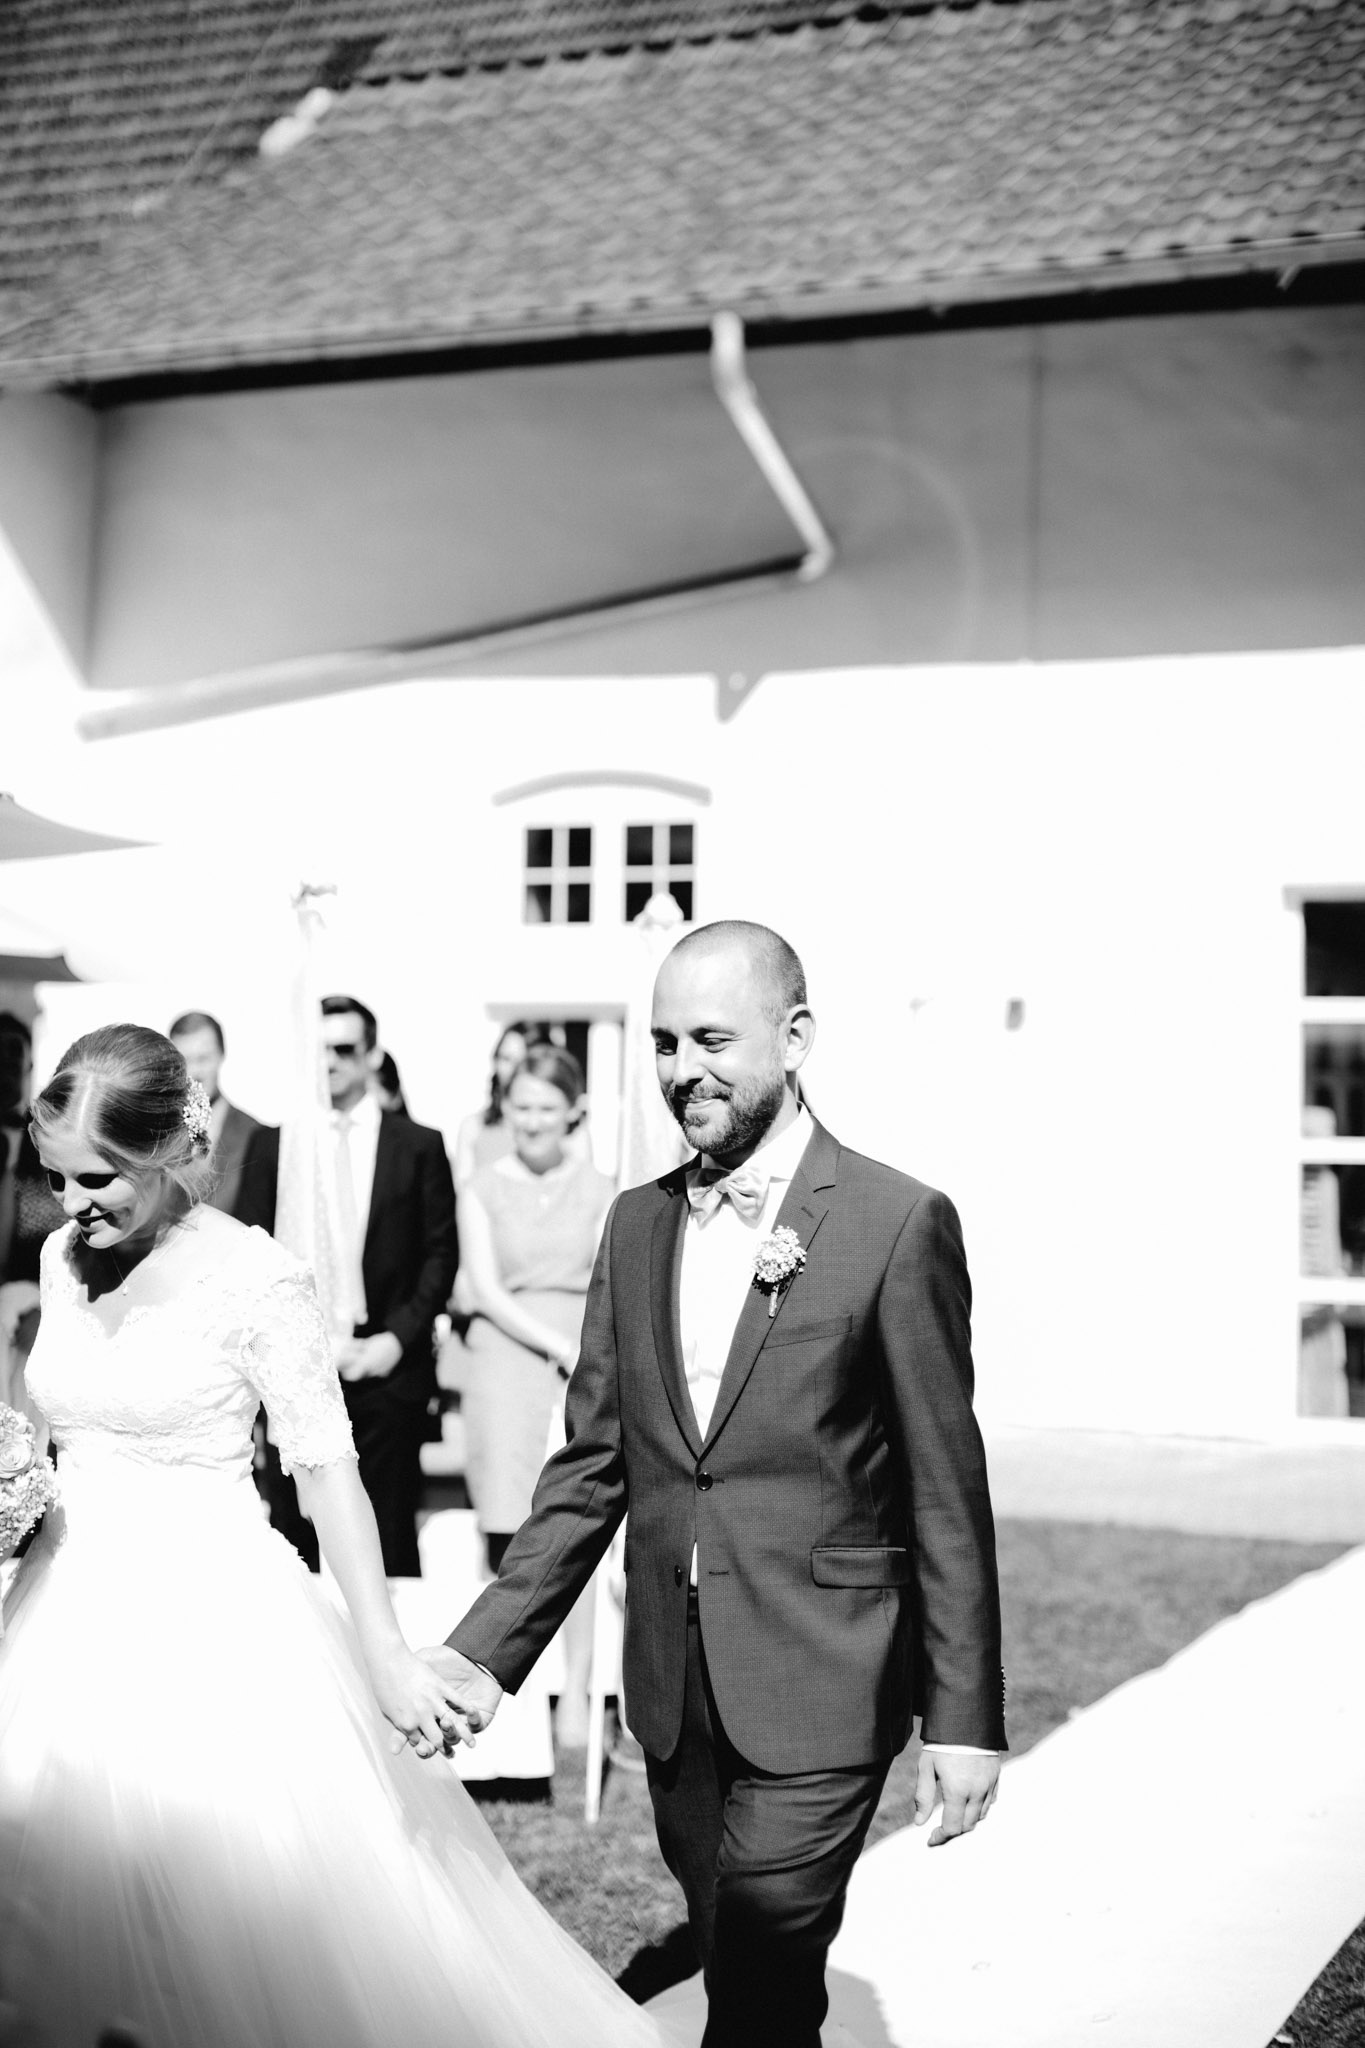 Lilienhof-Freiburg-Hochzeit-Pia-Anna-Christian-Wedding-Photography-FS-41.jpg